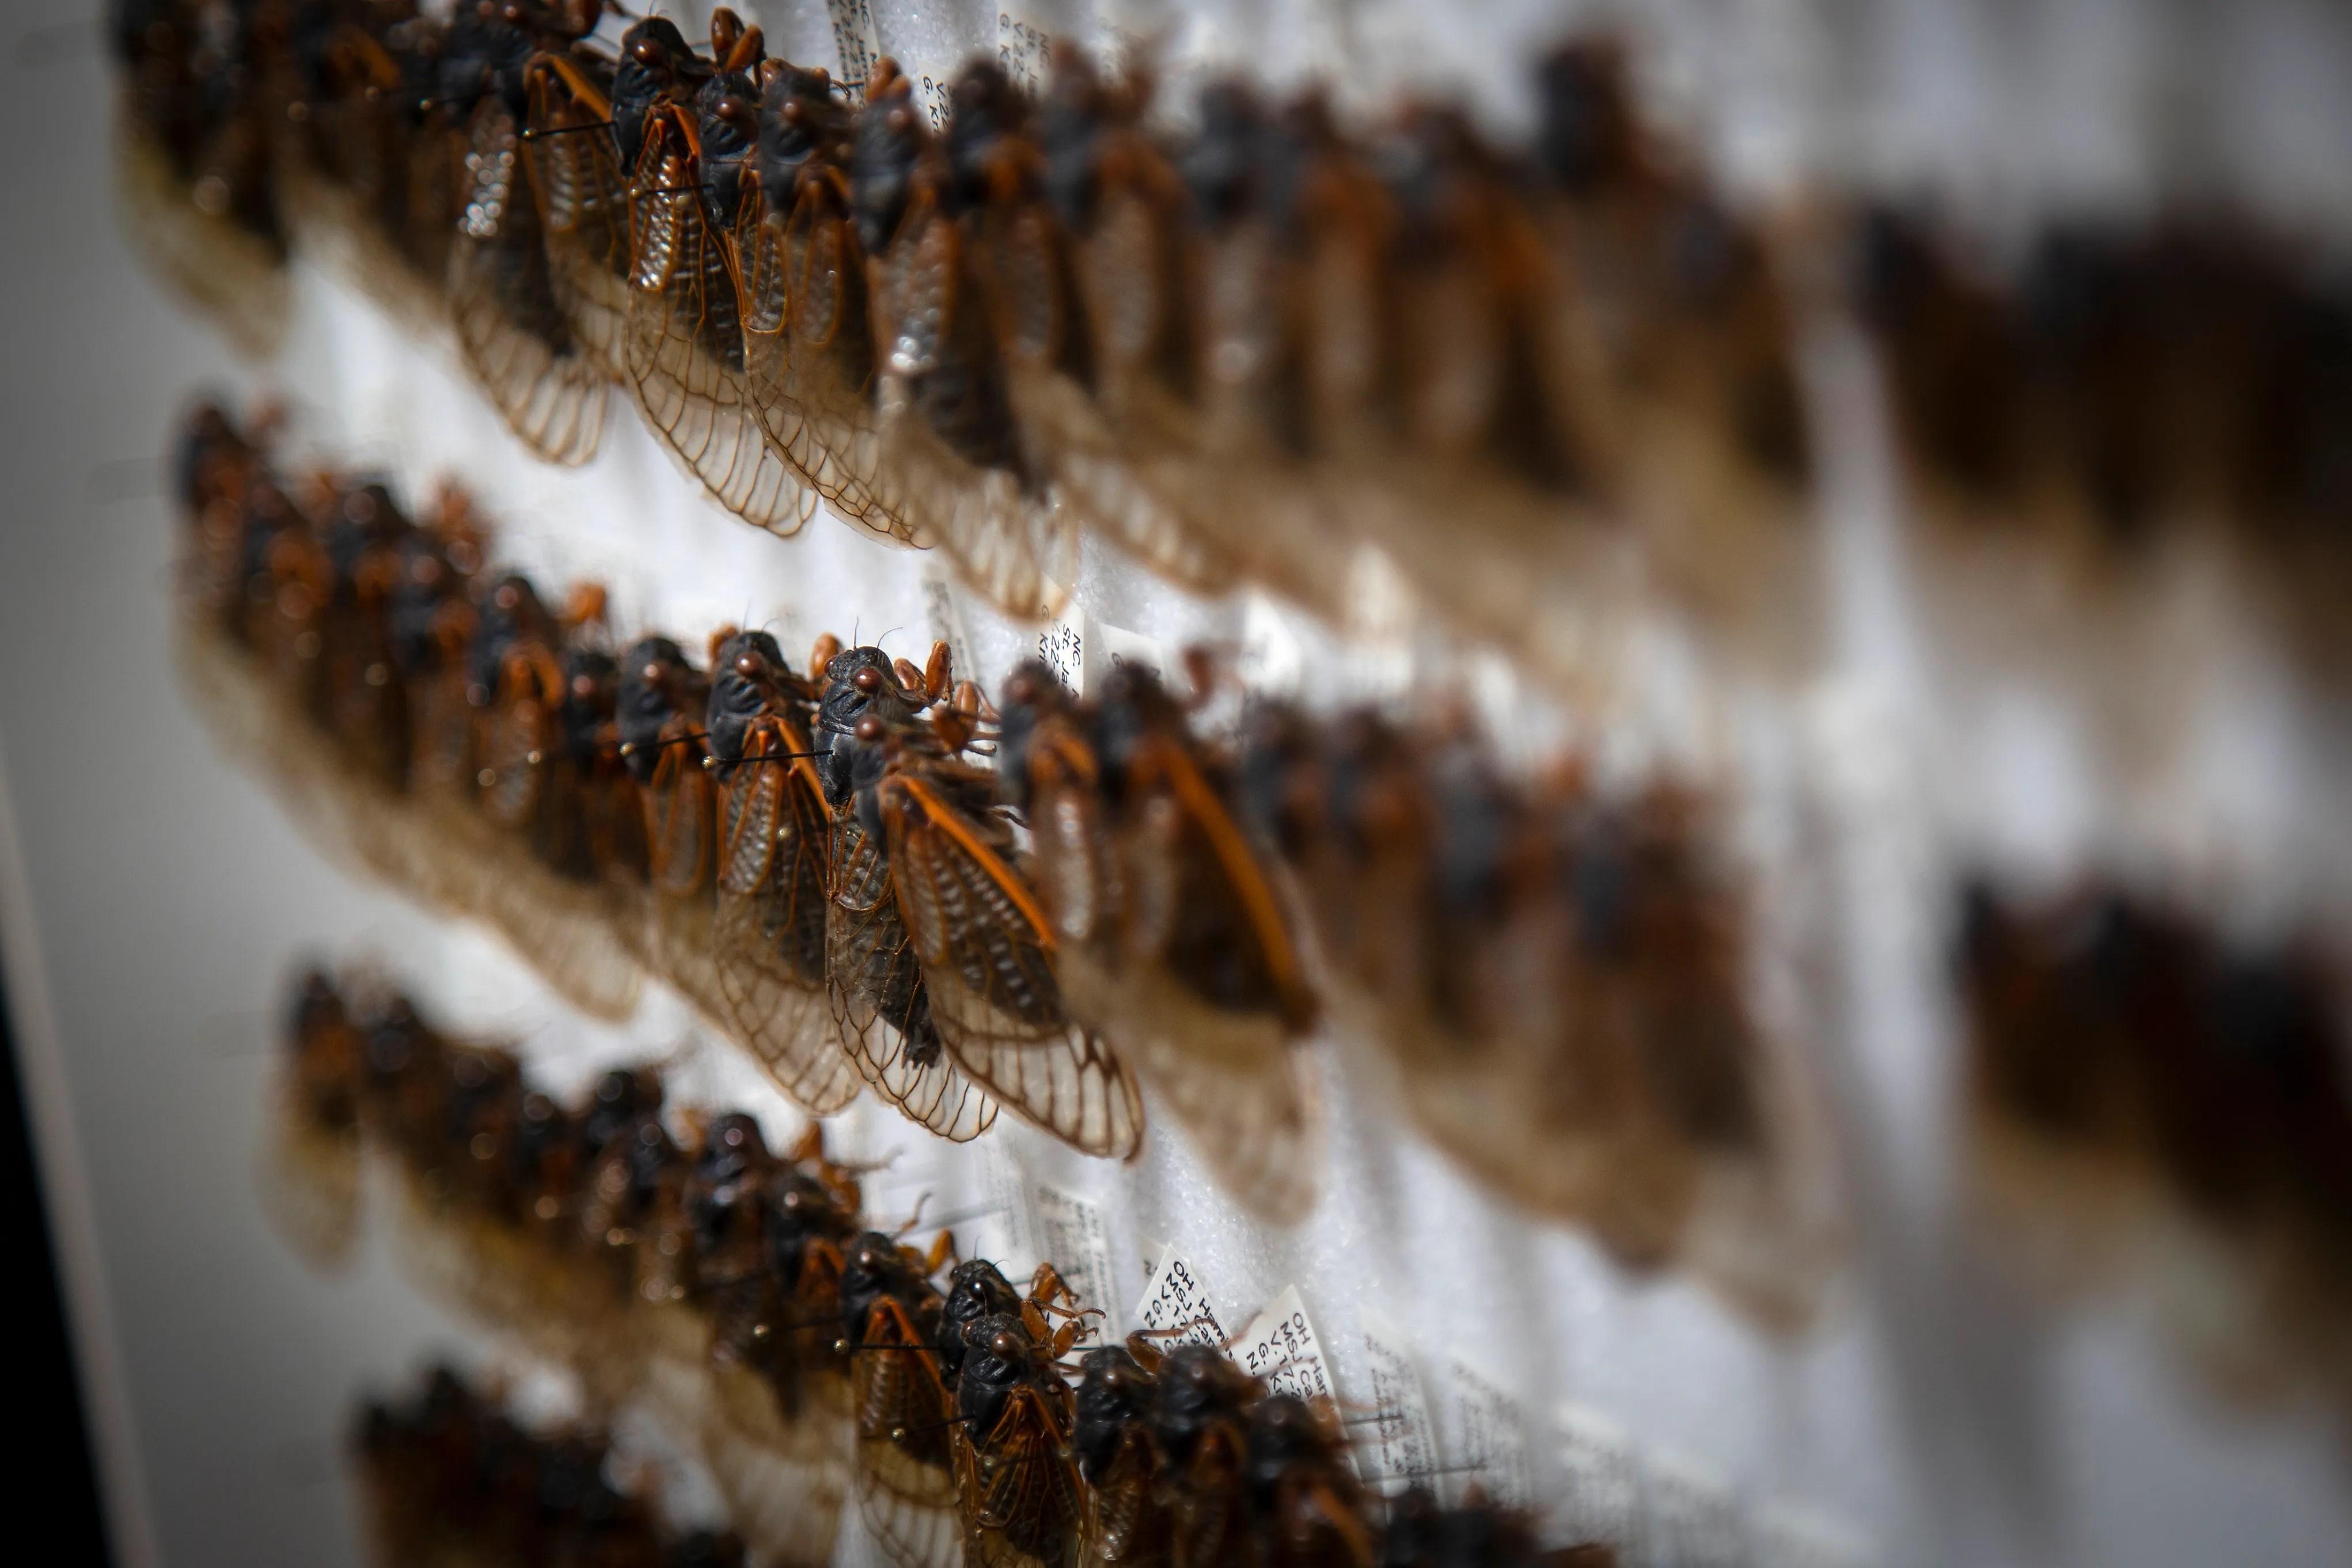 Dozens of cicadas are preserved in Gene Kritsky's office in Delhi Township, Ohio, on April 23, 2021.